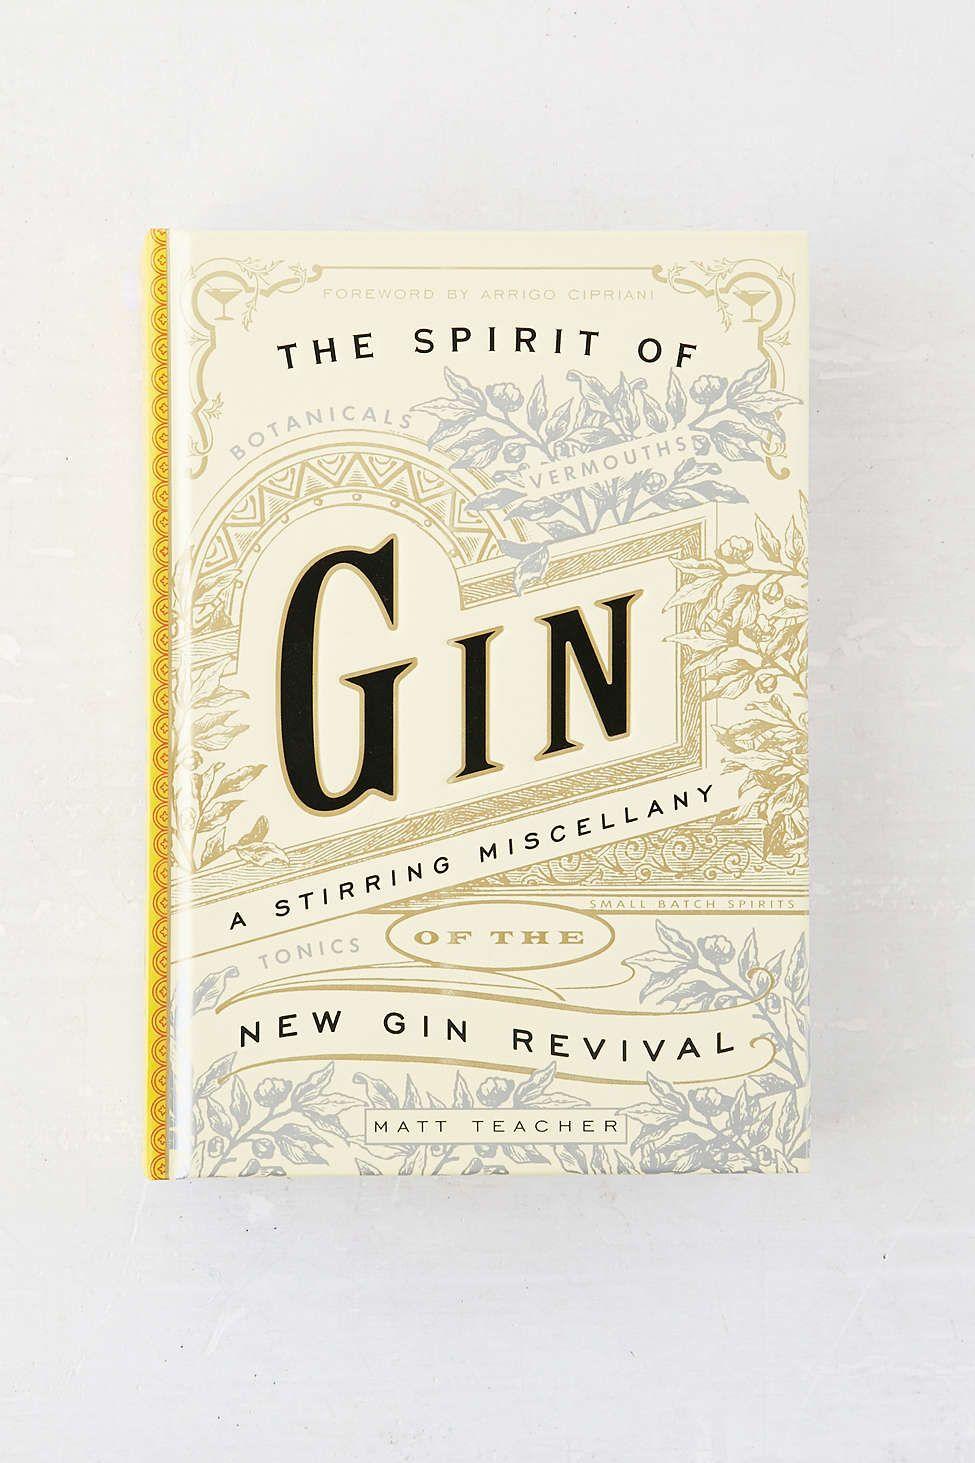 The Spirit Of Gin: A Stirring Miscellany Of The New Gin Revival By Matt Teacher, Greg Jones & Arrigo Cipriani